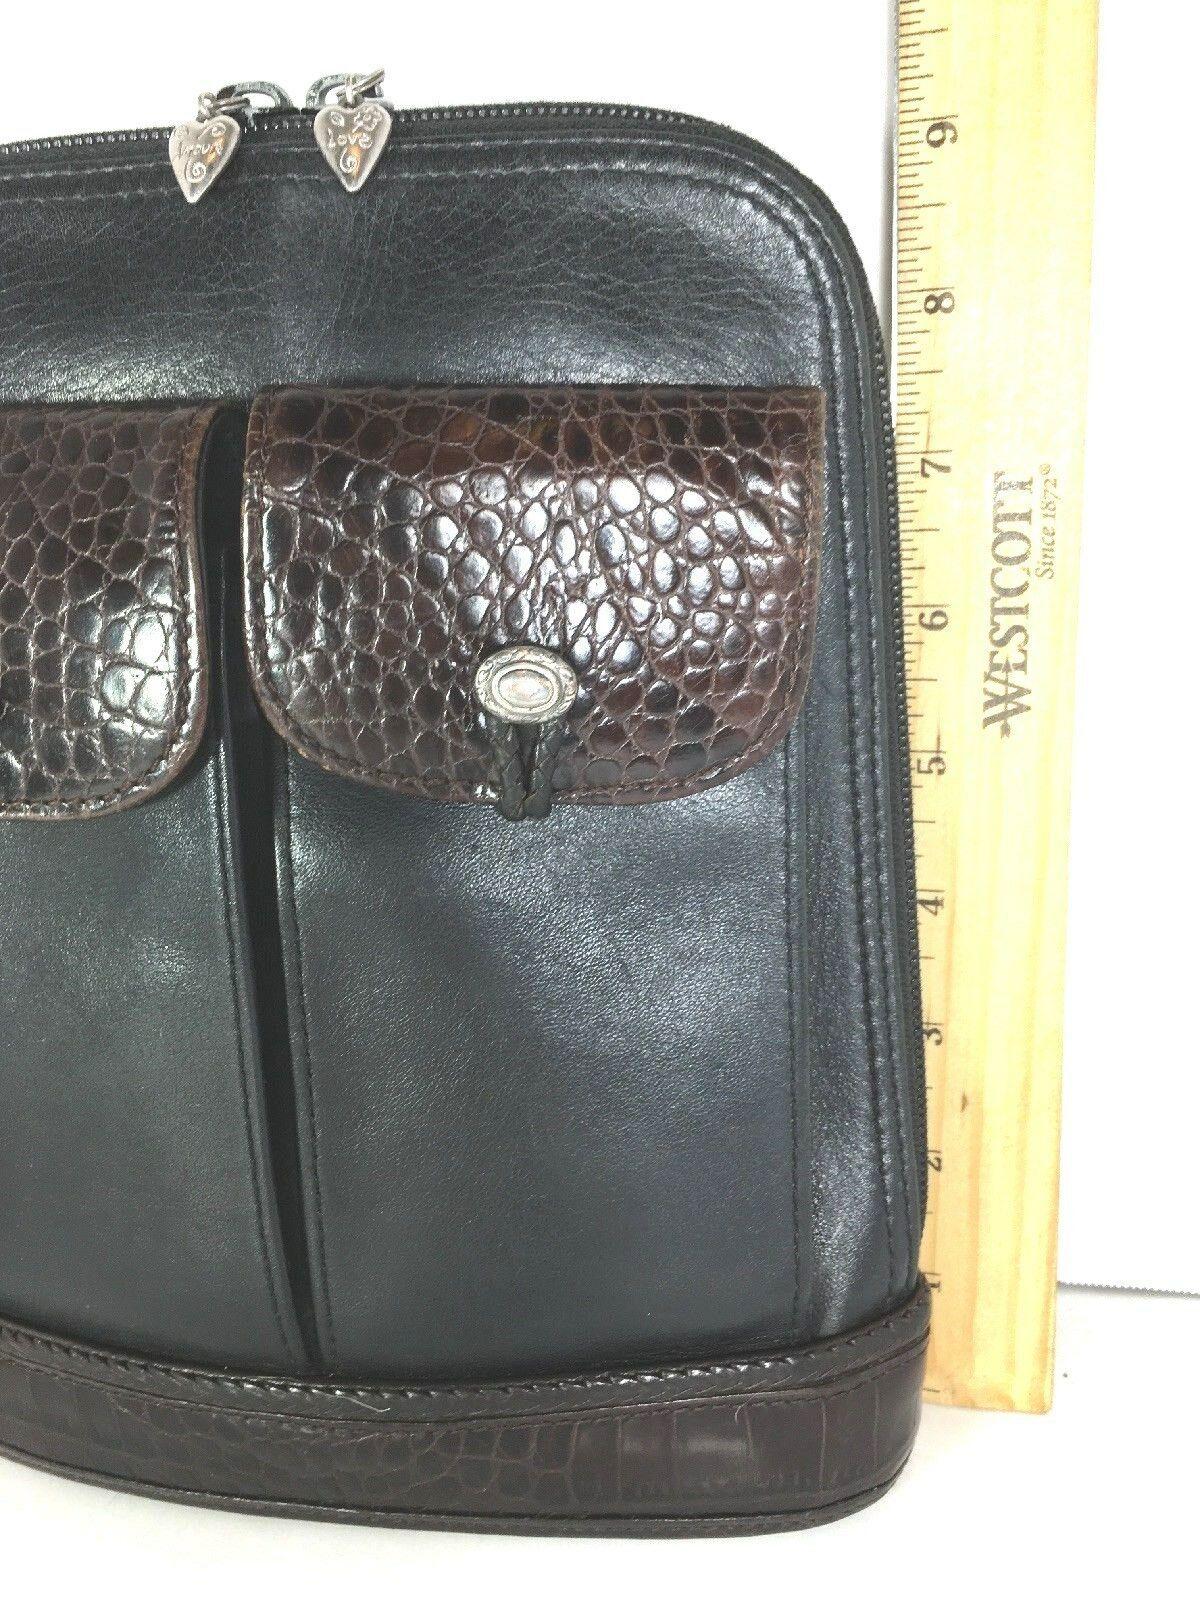 Brighton Vintage Small Black Leather with Brown Reptile Print Trim Shoulder Bag